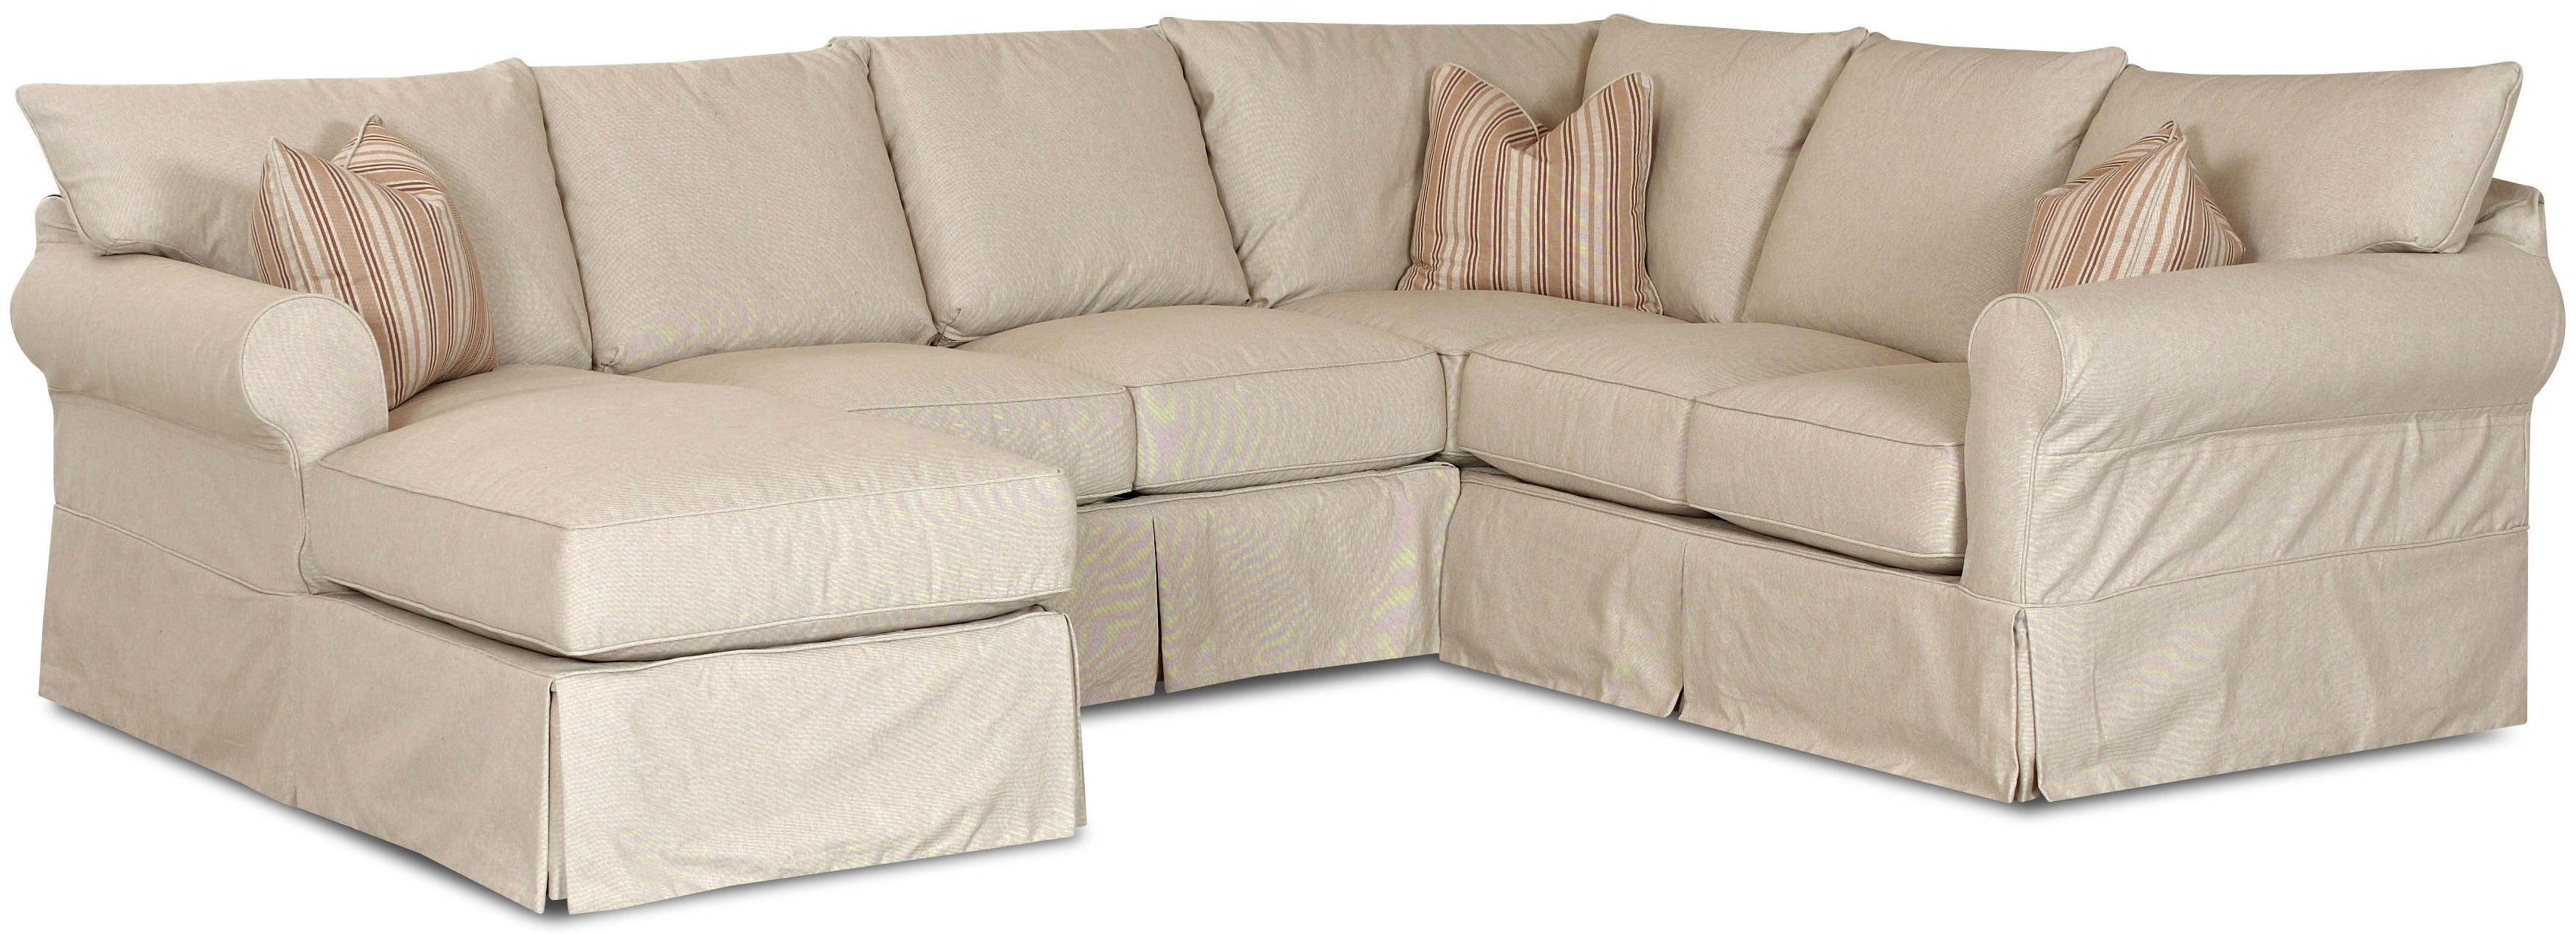 Slipcover Sectional Sofa Winda 7 Furniture